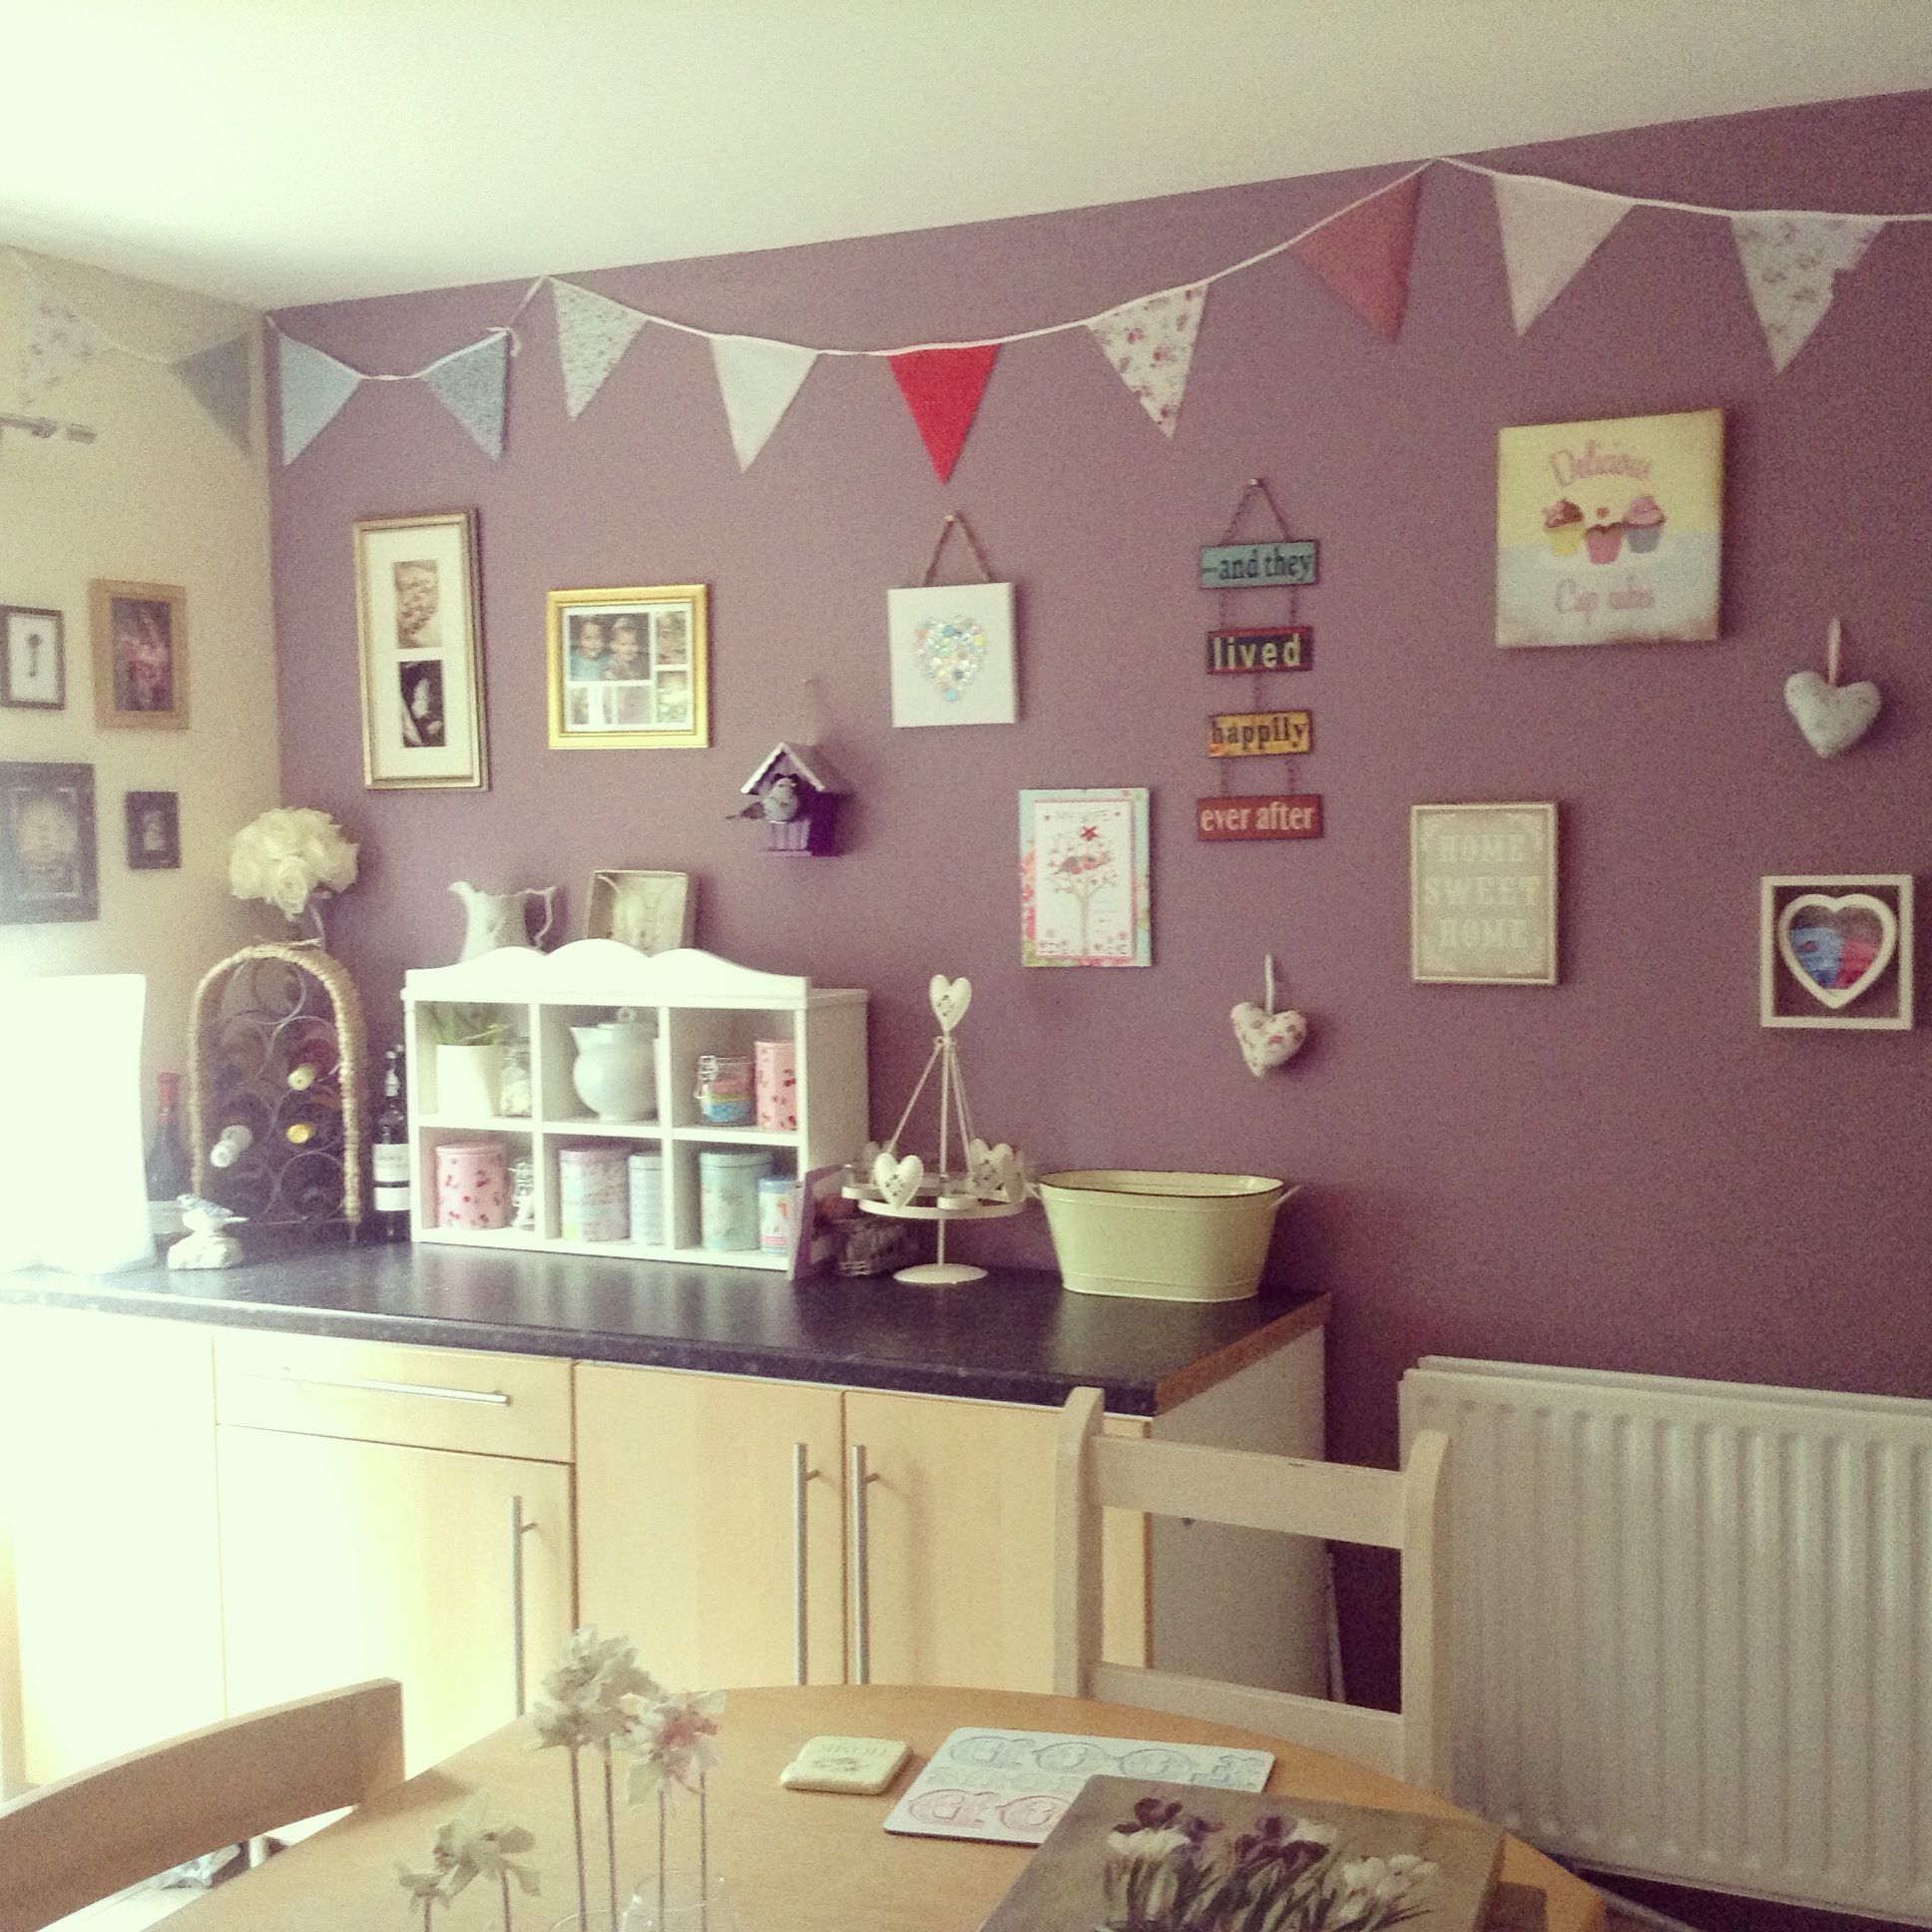 My kitchen feature wall home ideas pinterest for Kitchen feature wall ideas